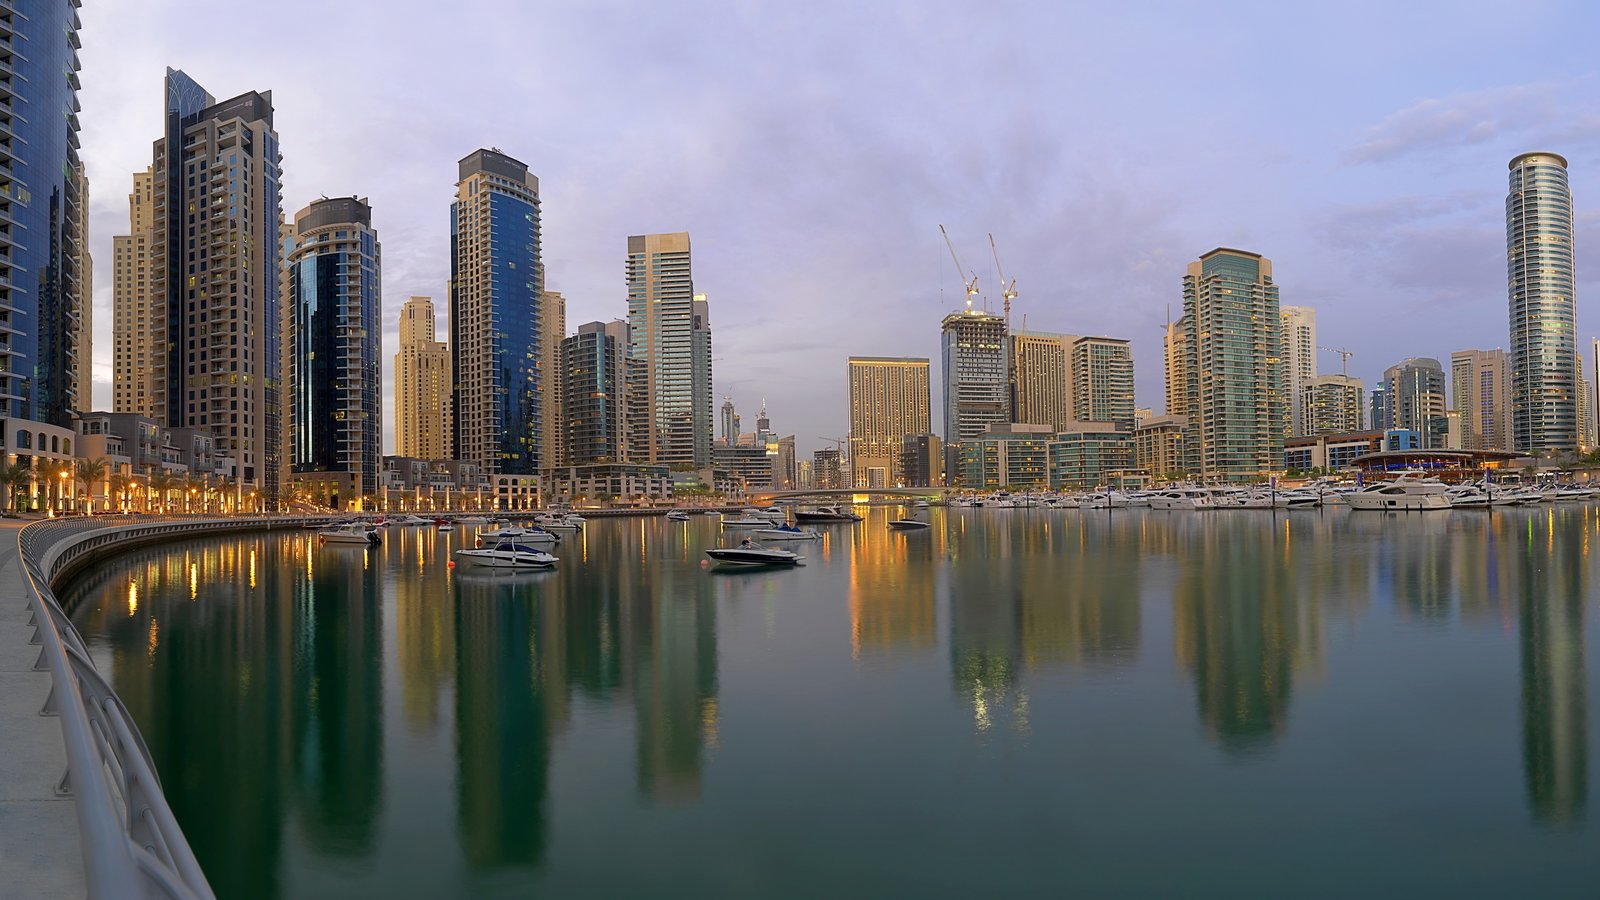 Dubai Marina showing cbd, skyline and boating